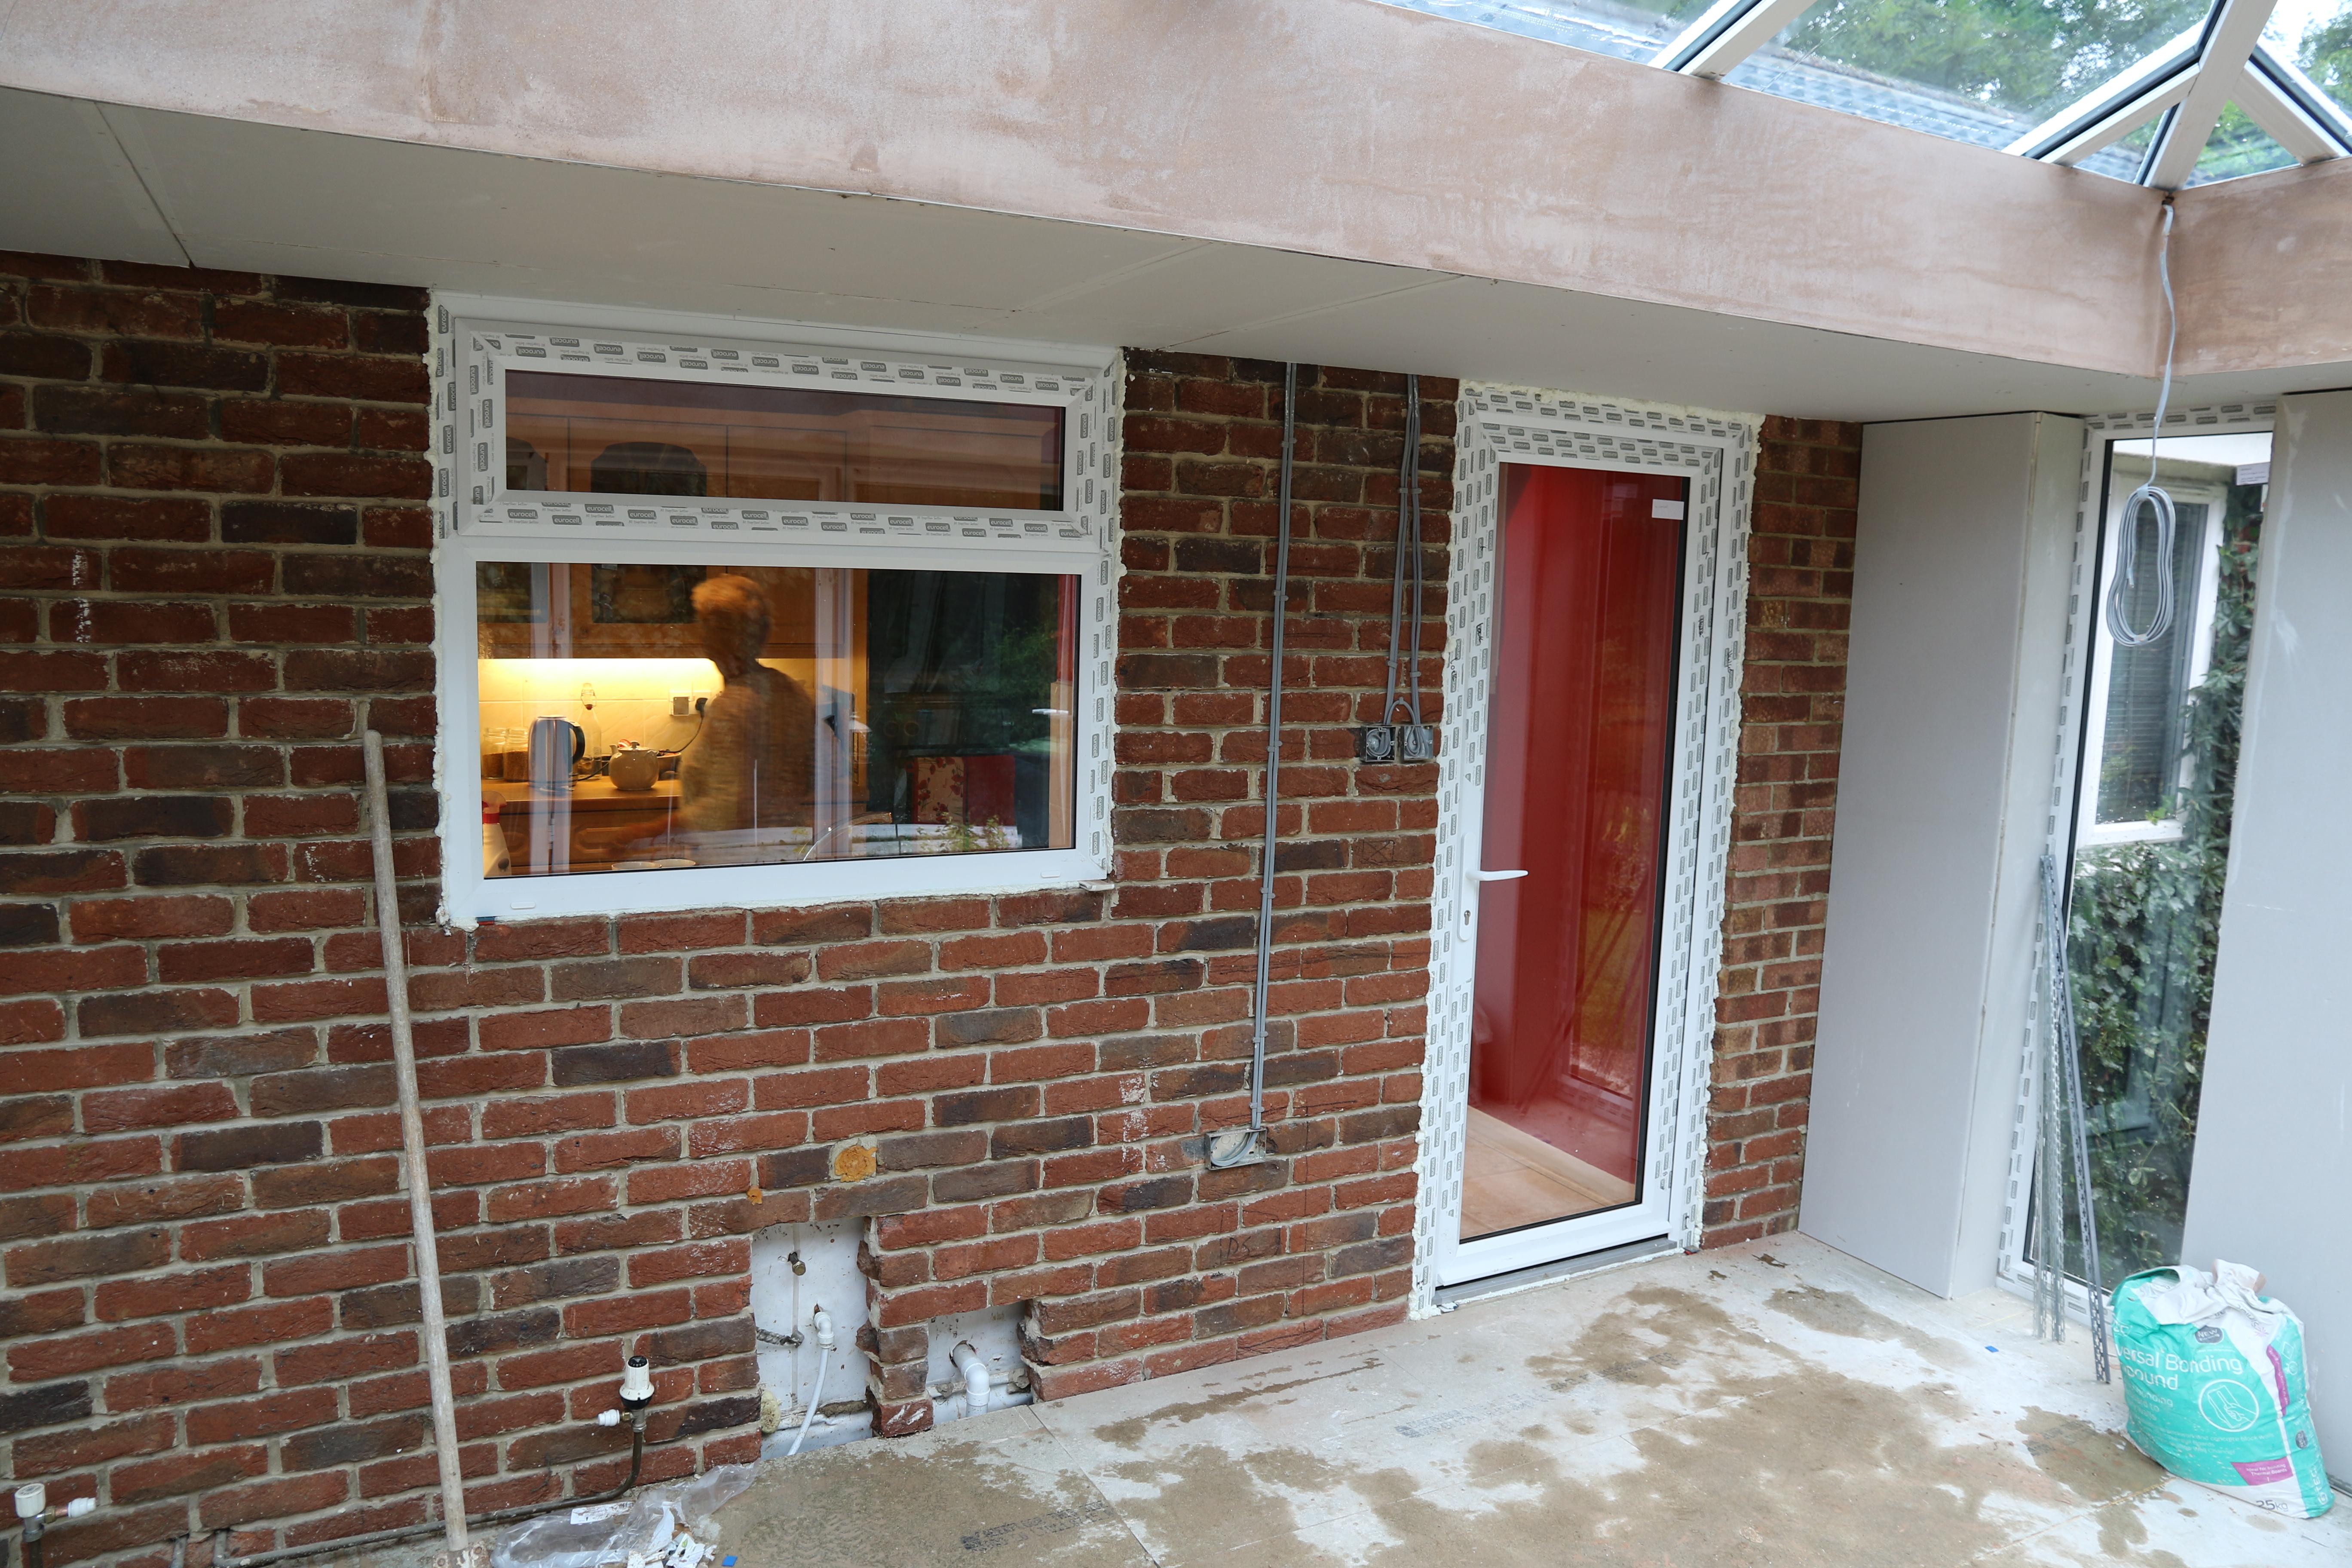 Conservatory - New kitchen door and window.